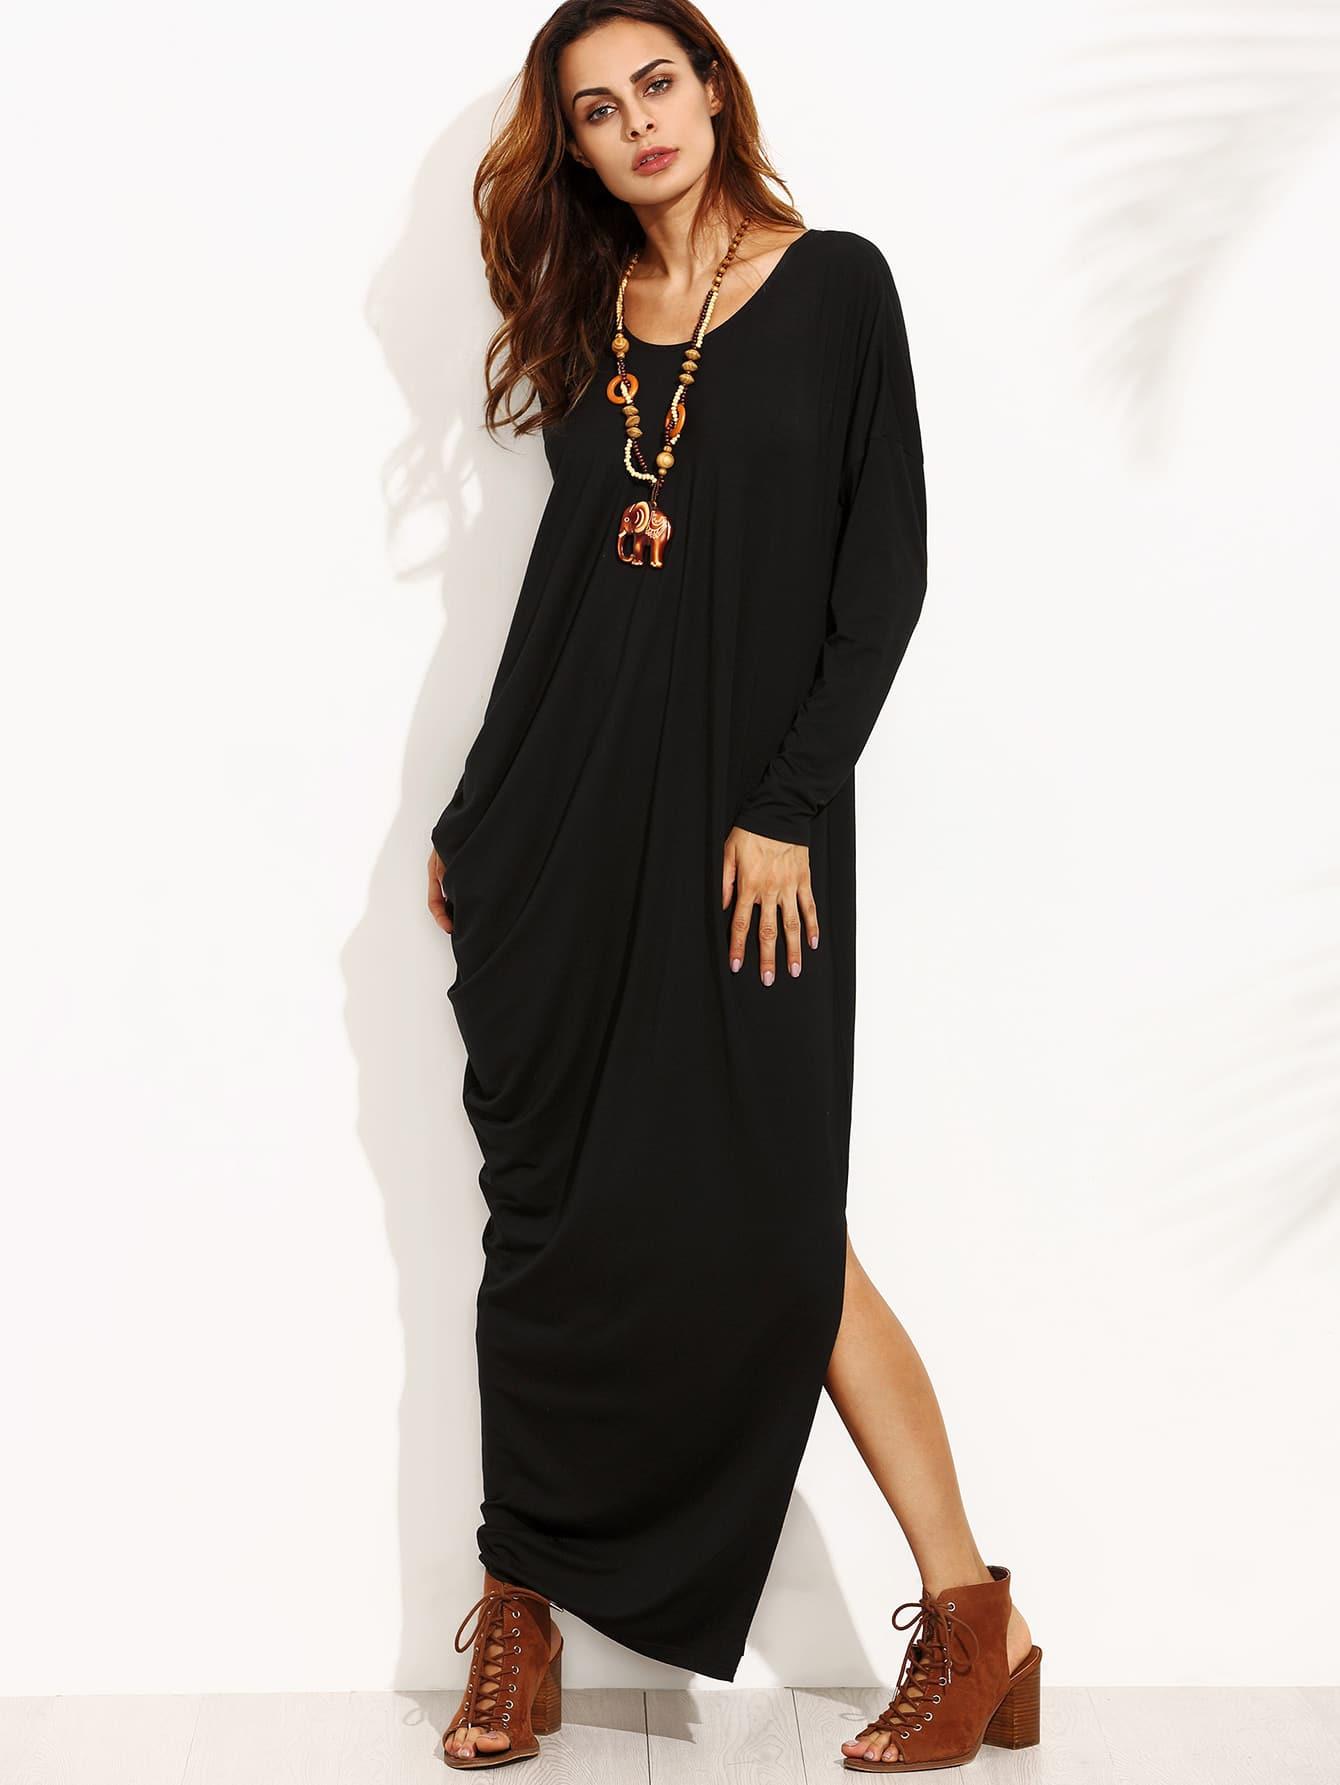 Black Split Side Long Sleeve Asymmetrical Maxi Dress dress160729708